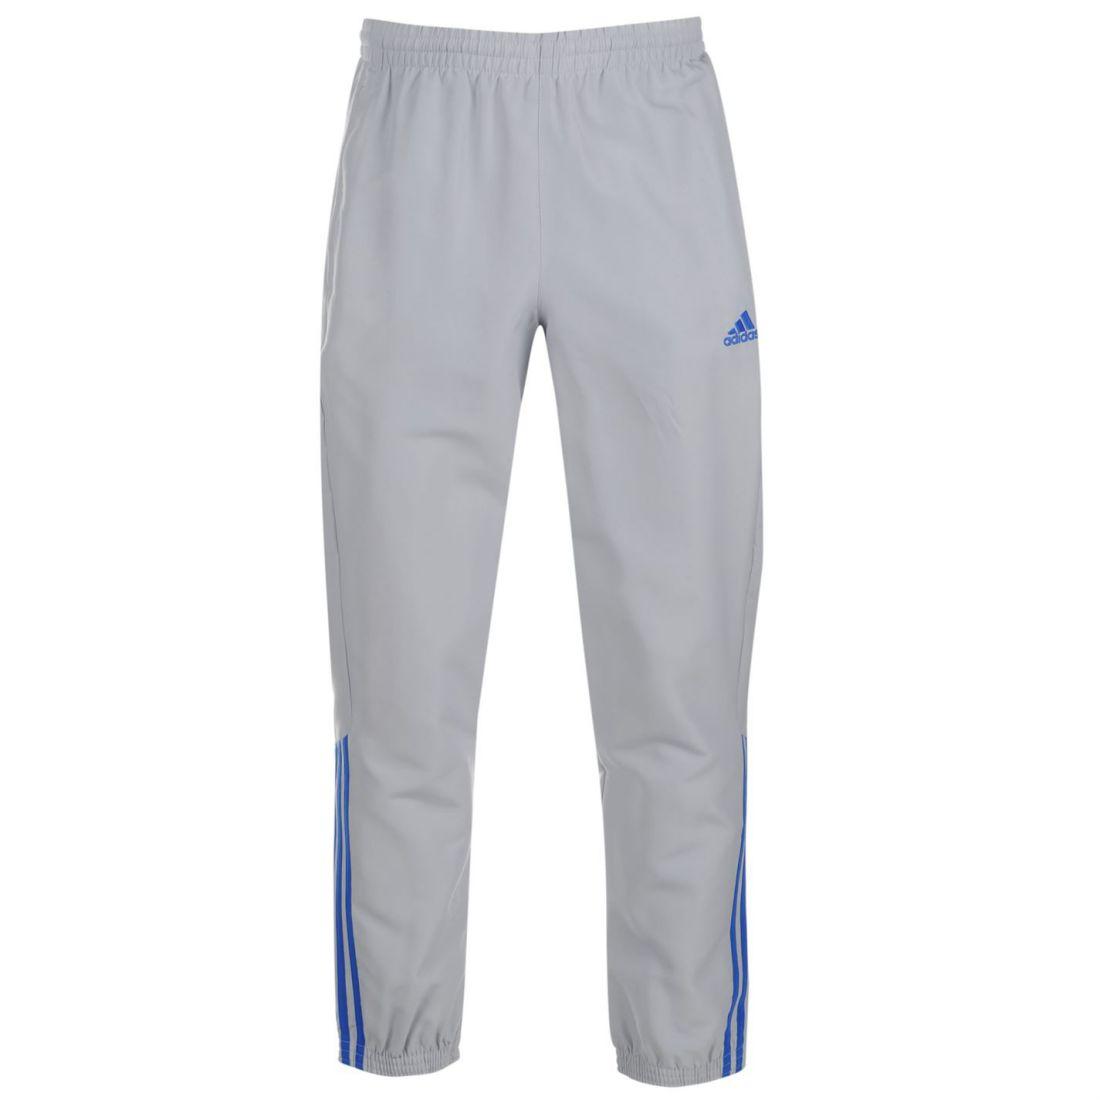 d9b843664b5f adidas Mens Gents Samson 2 Tracksuit Cuffed Ankles Stretch Sport ...